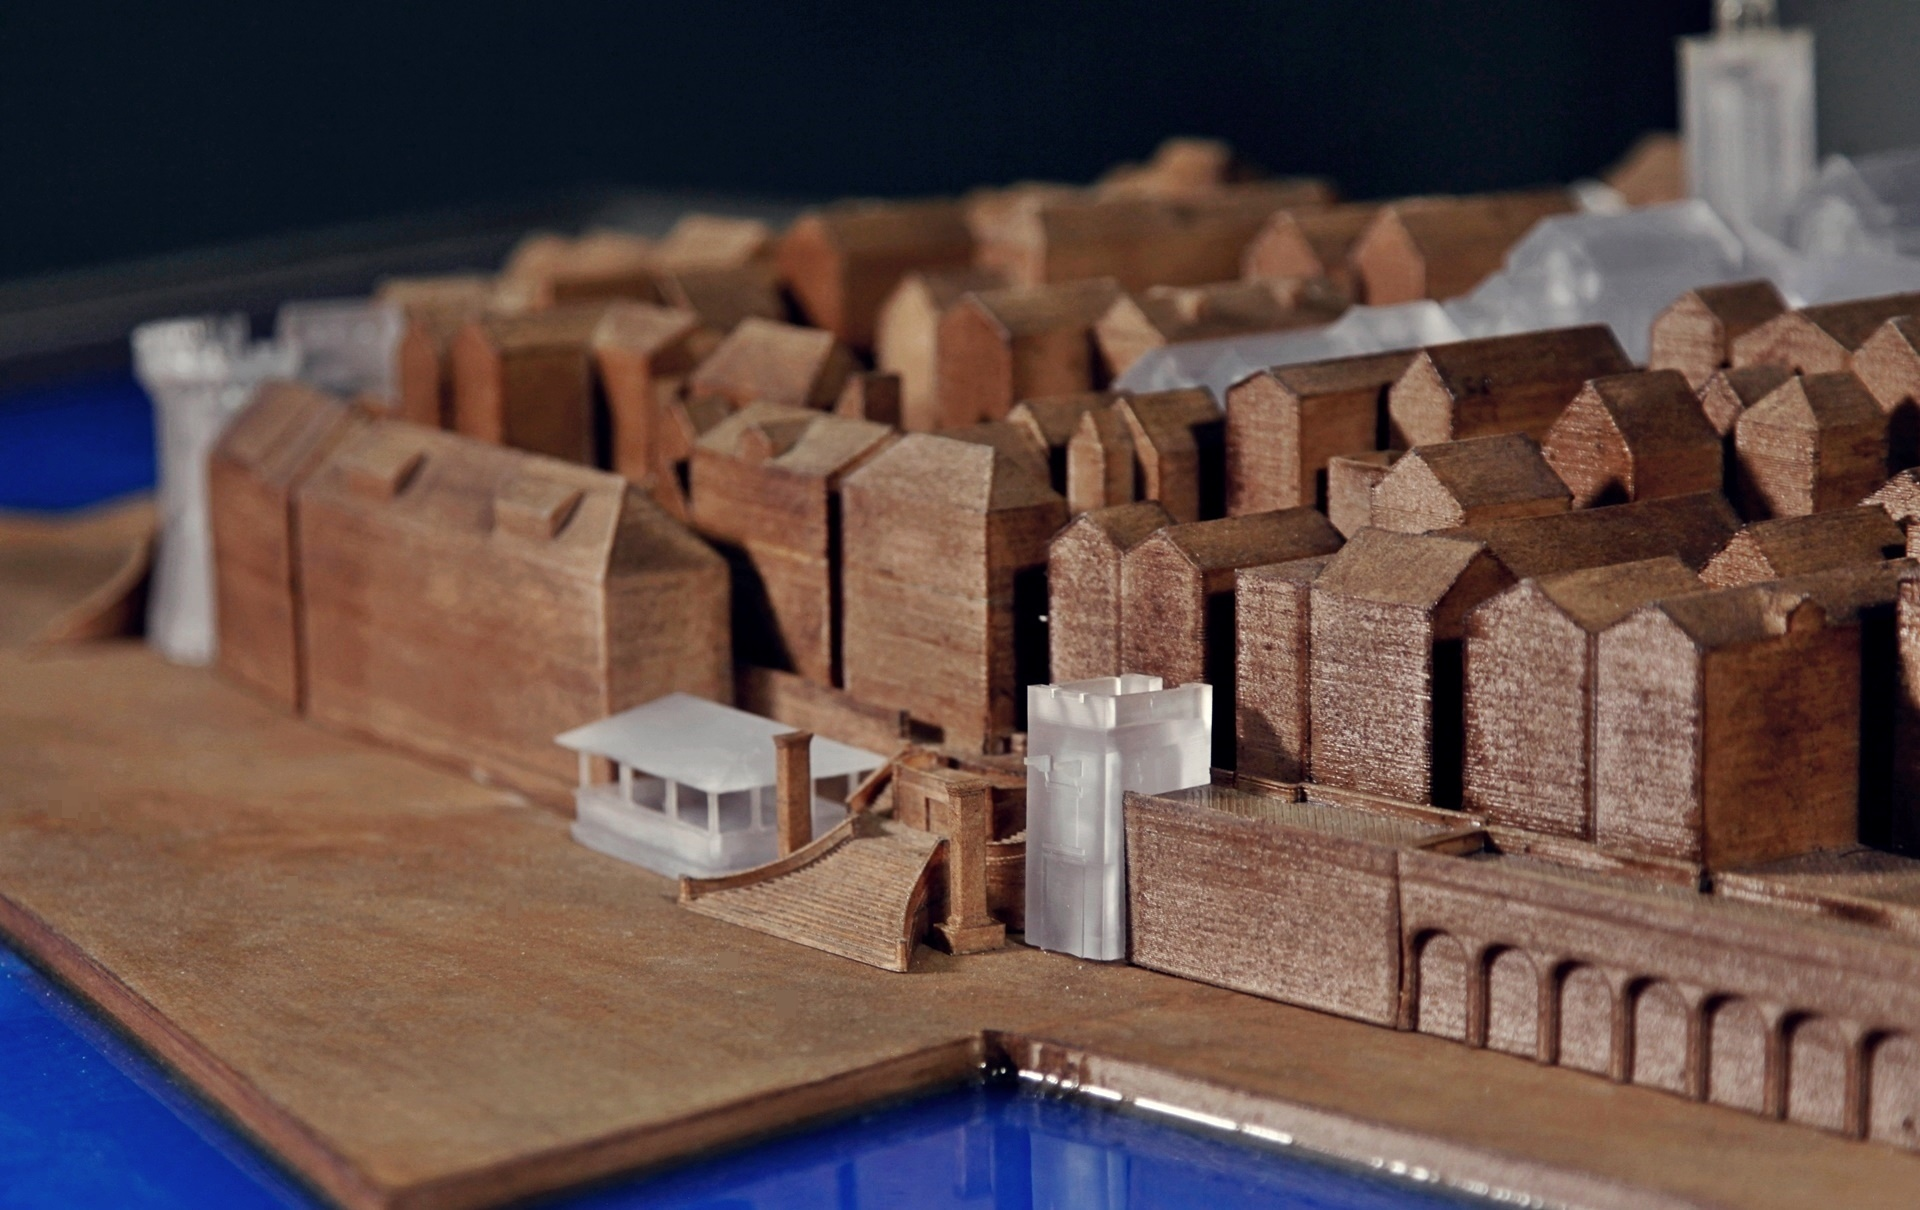 korčula city 3D printed